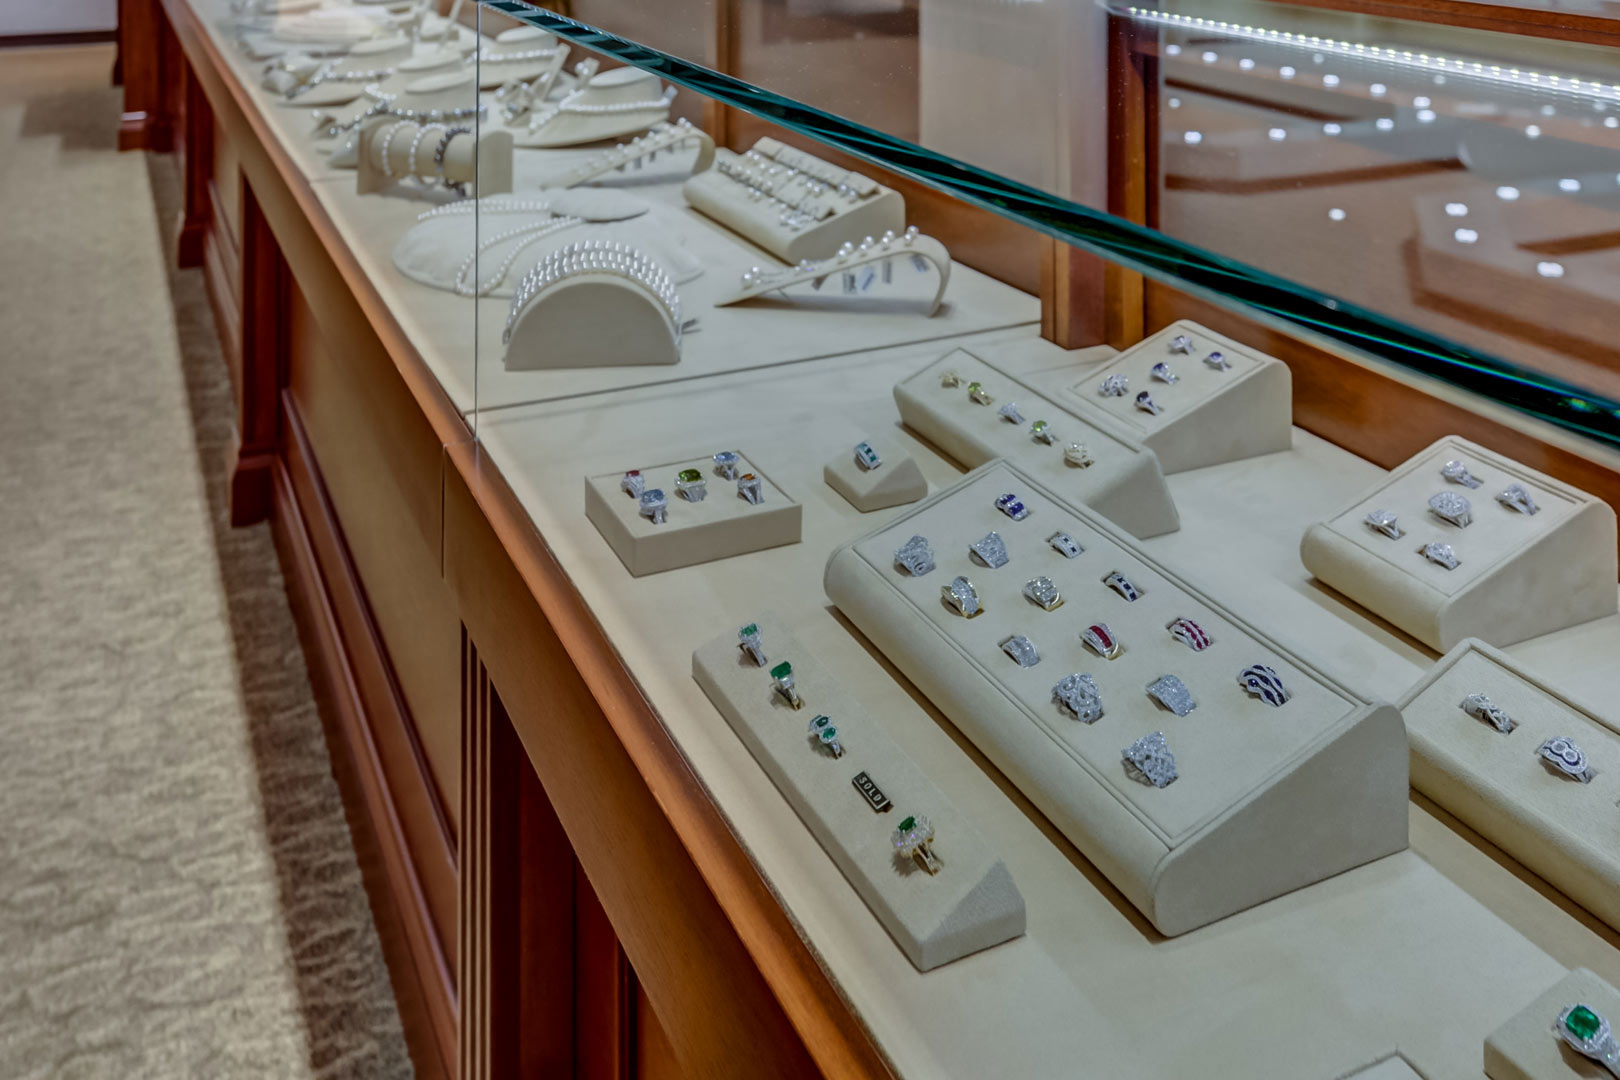 Albertine-Commercial-Bob-Richards-Jewelers-11.jpg